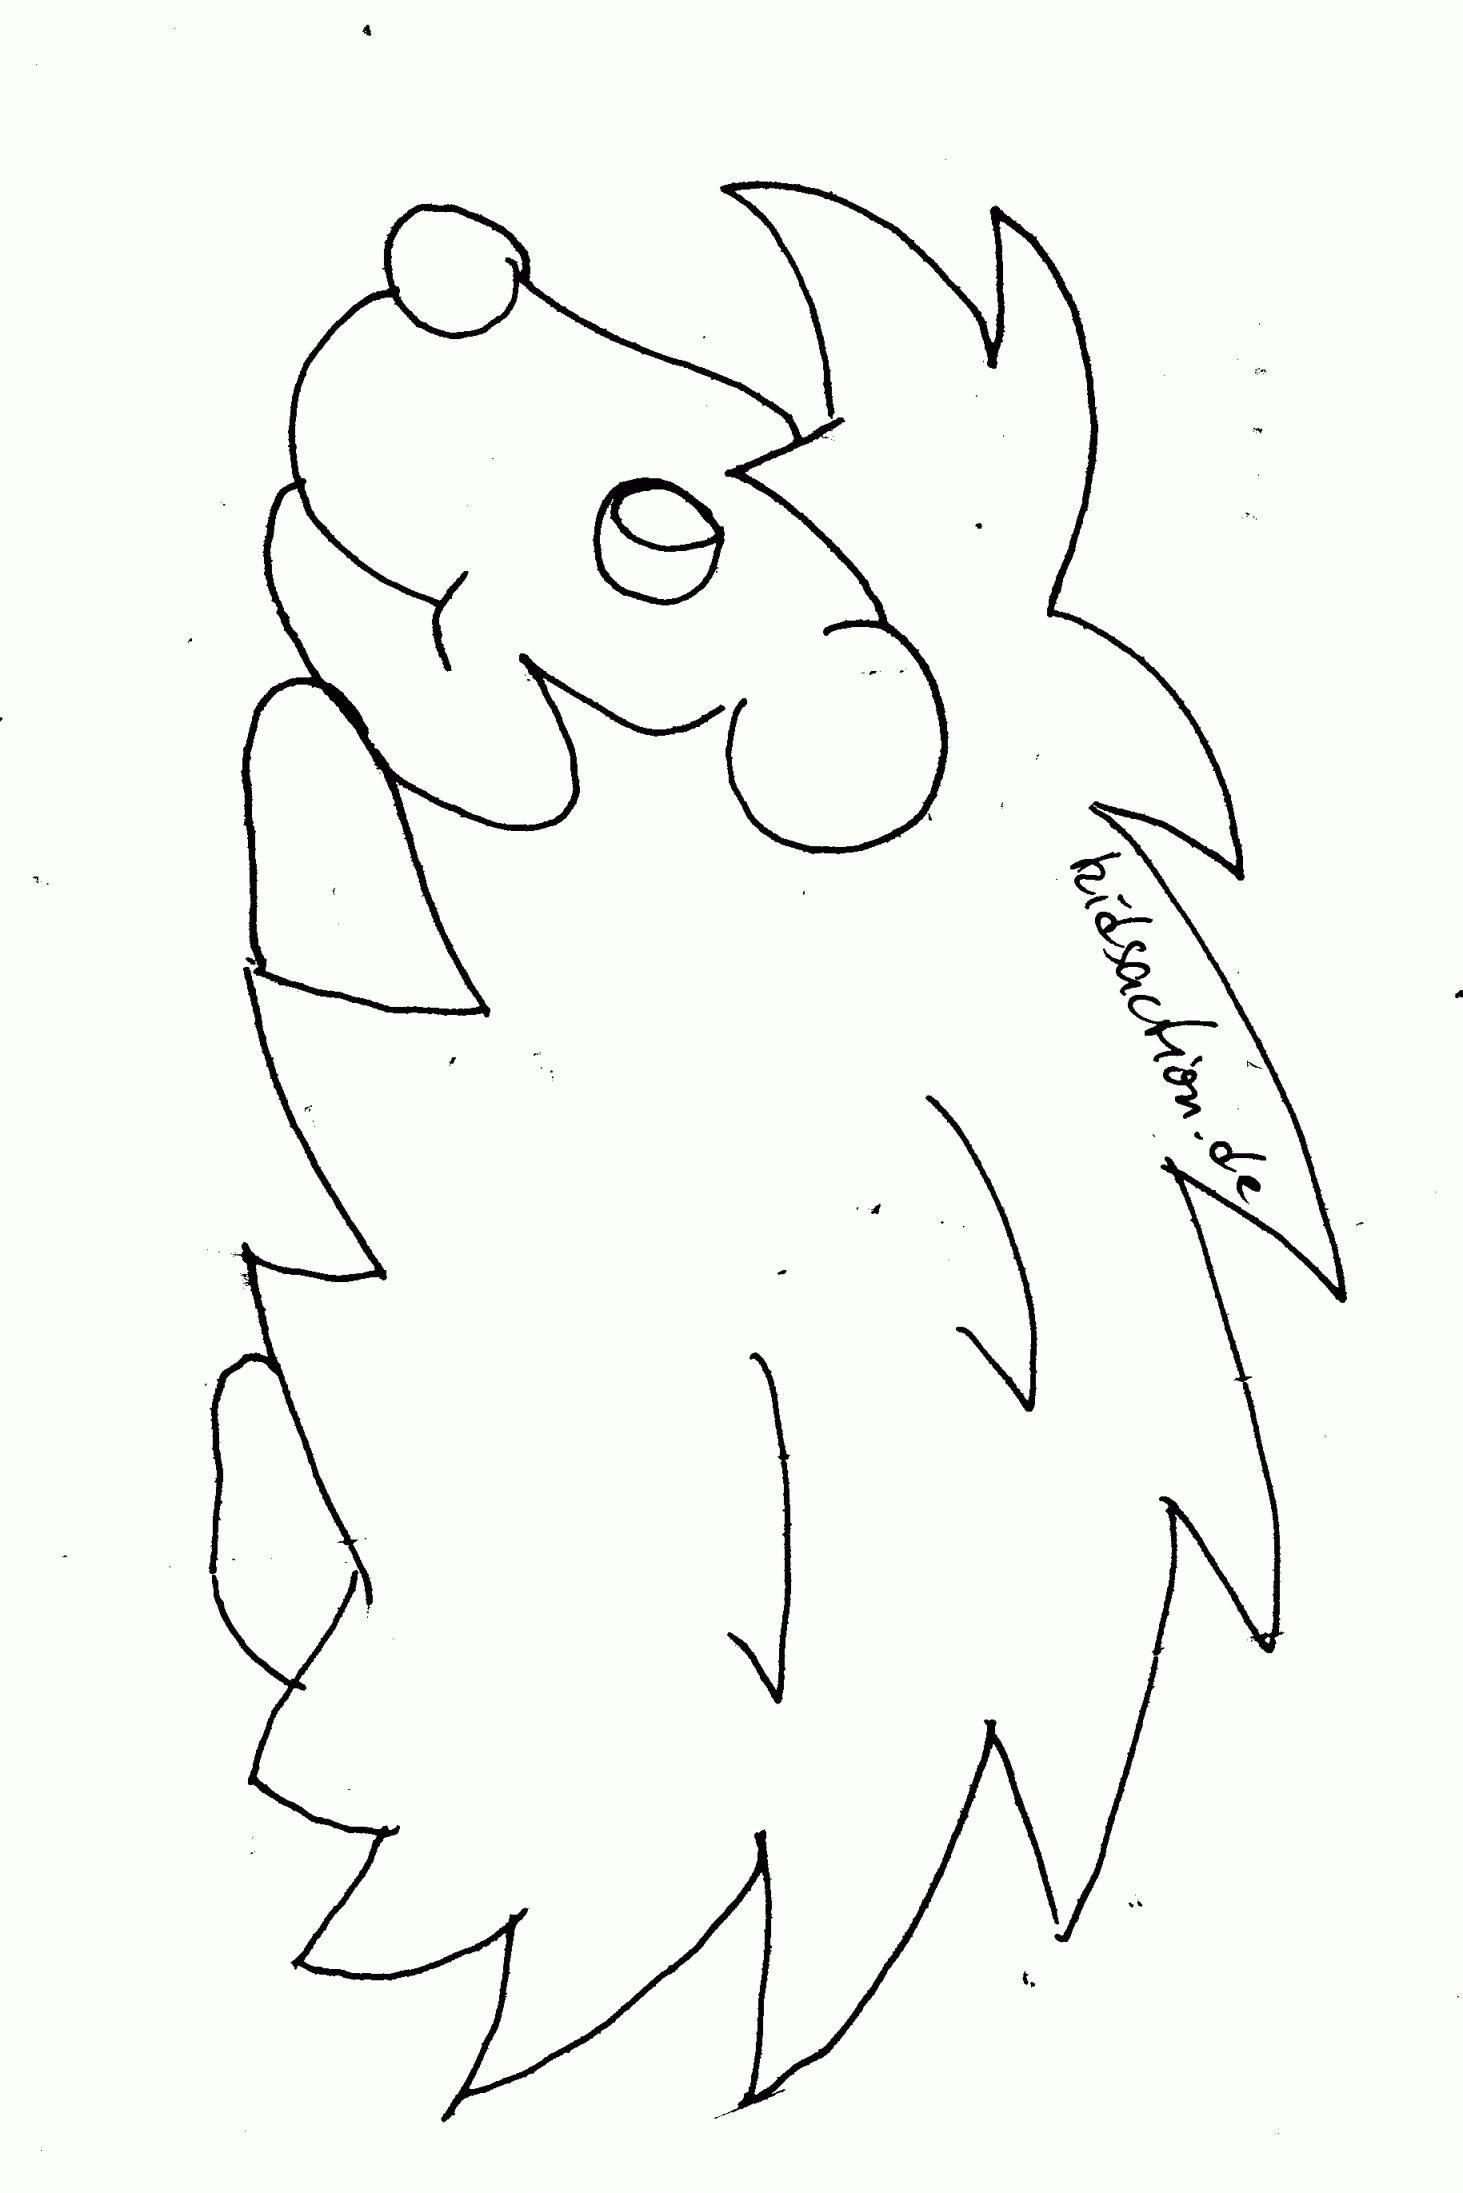 Keith Haring Ausmalbilder élégant graphie Malvorlagen Igel Elegant Igel Grundschule 0d Archives Uploadertalk